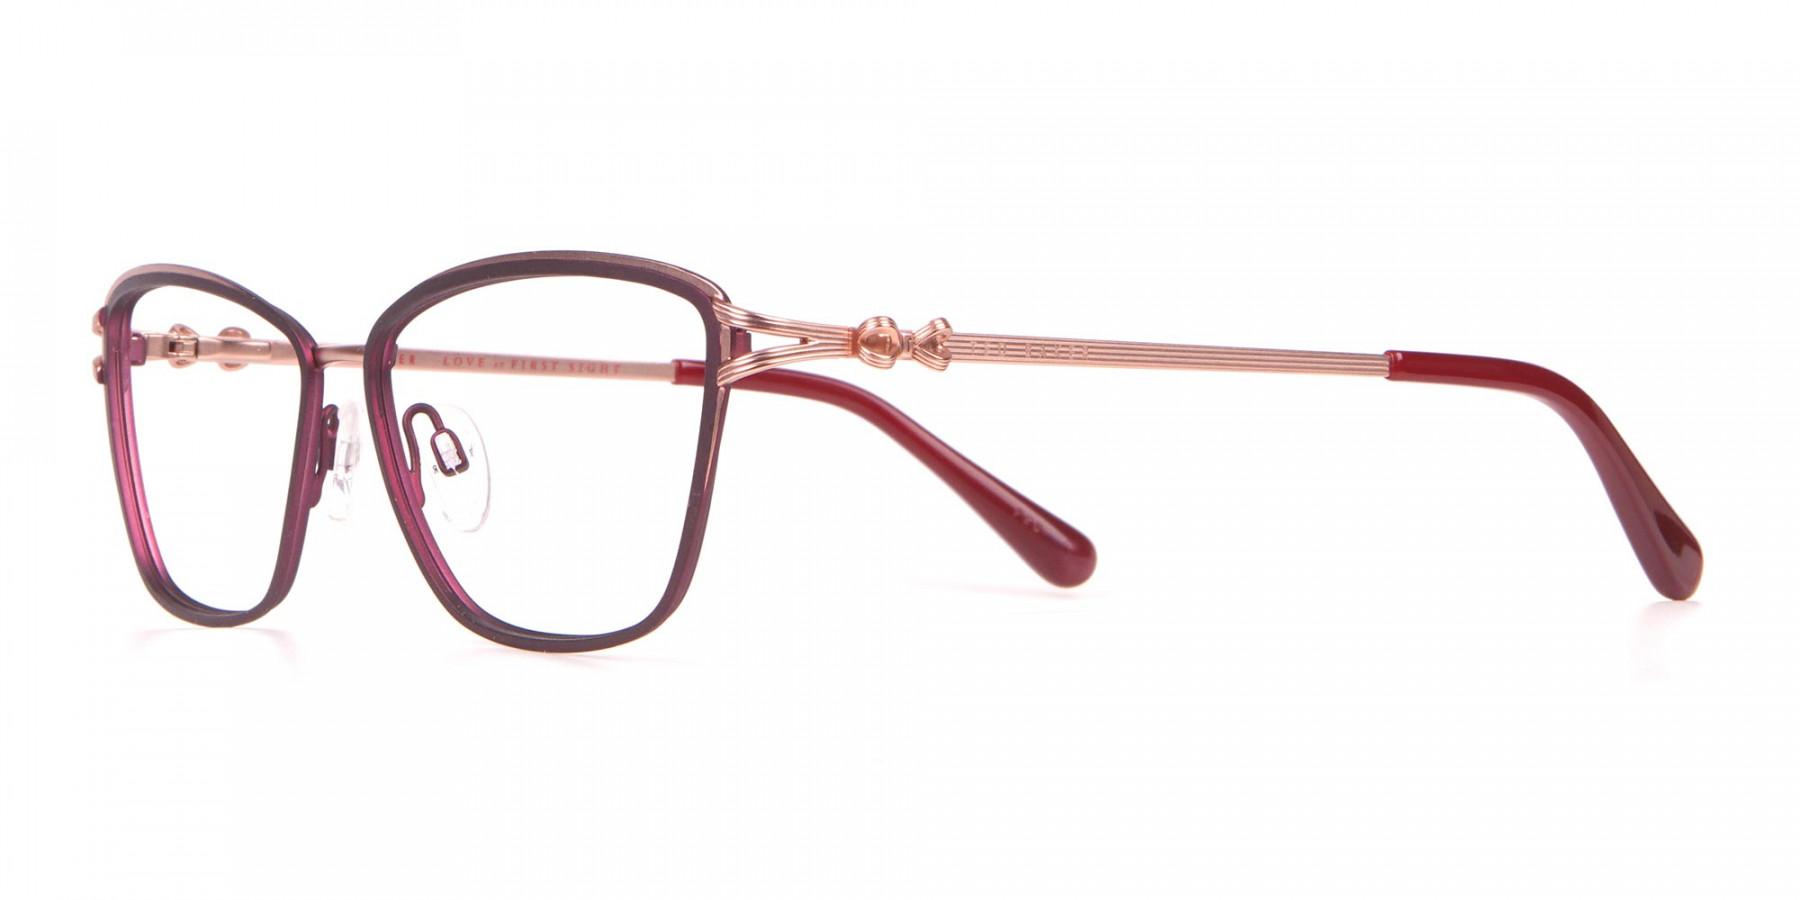 Ted Baker TB2245 Tula Women Classic Cateye Glasses Burgundy-1